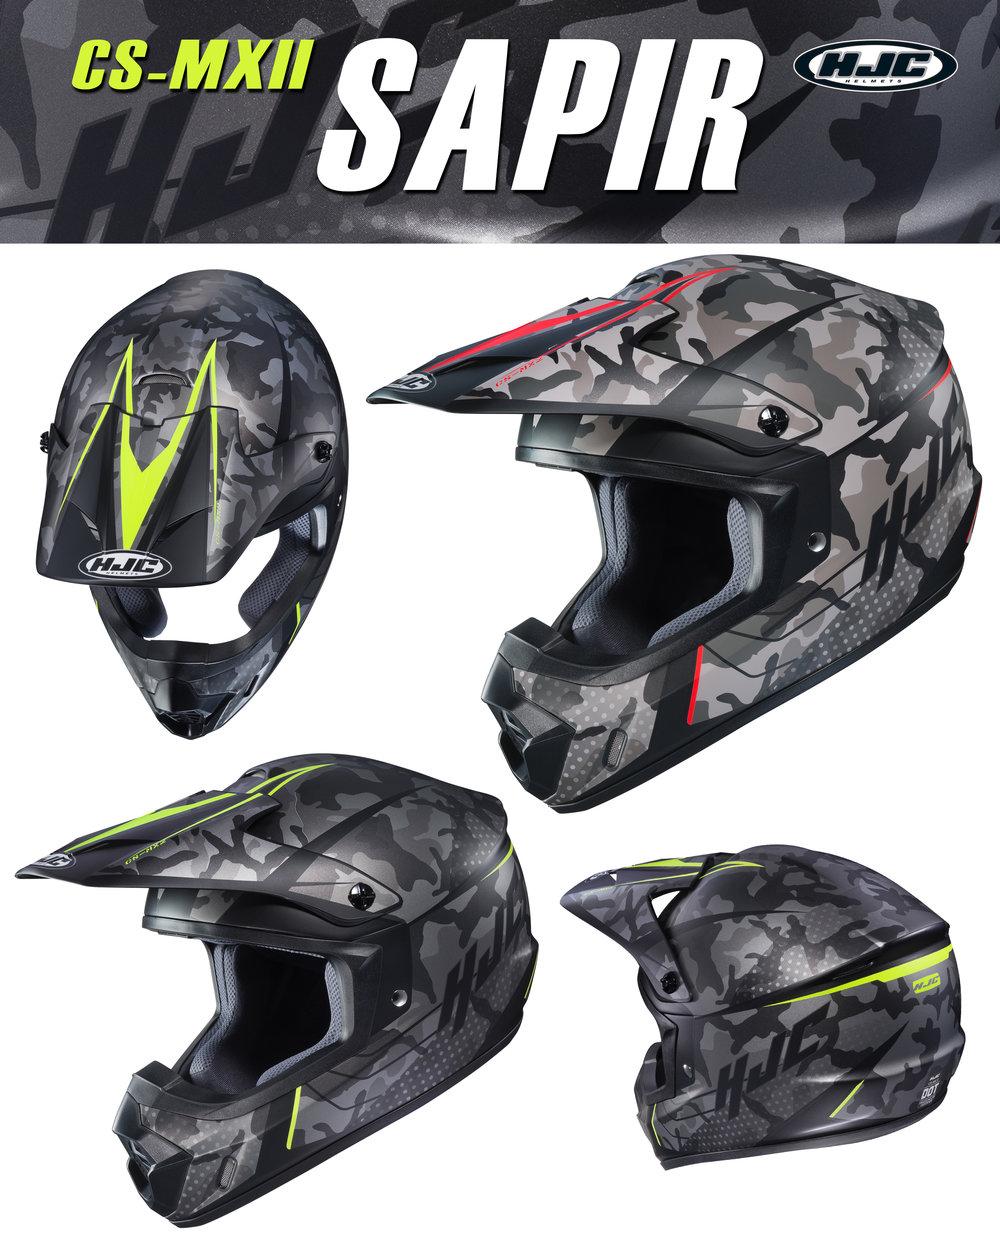 CSMXII Sapir Helmet Post.jpg